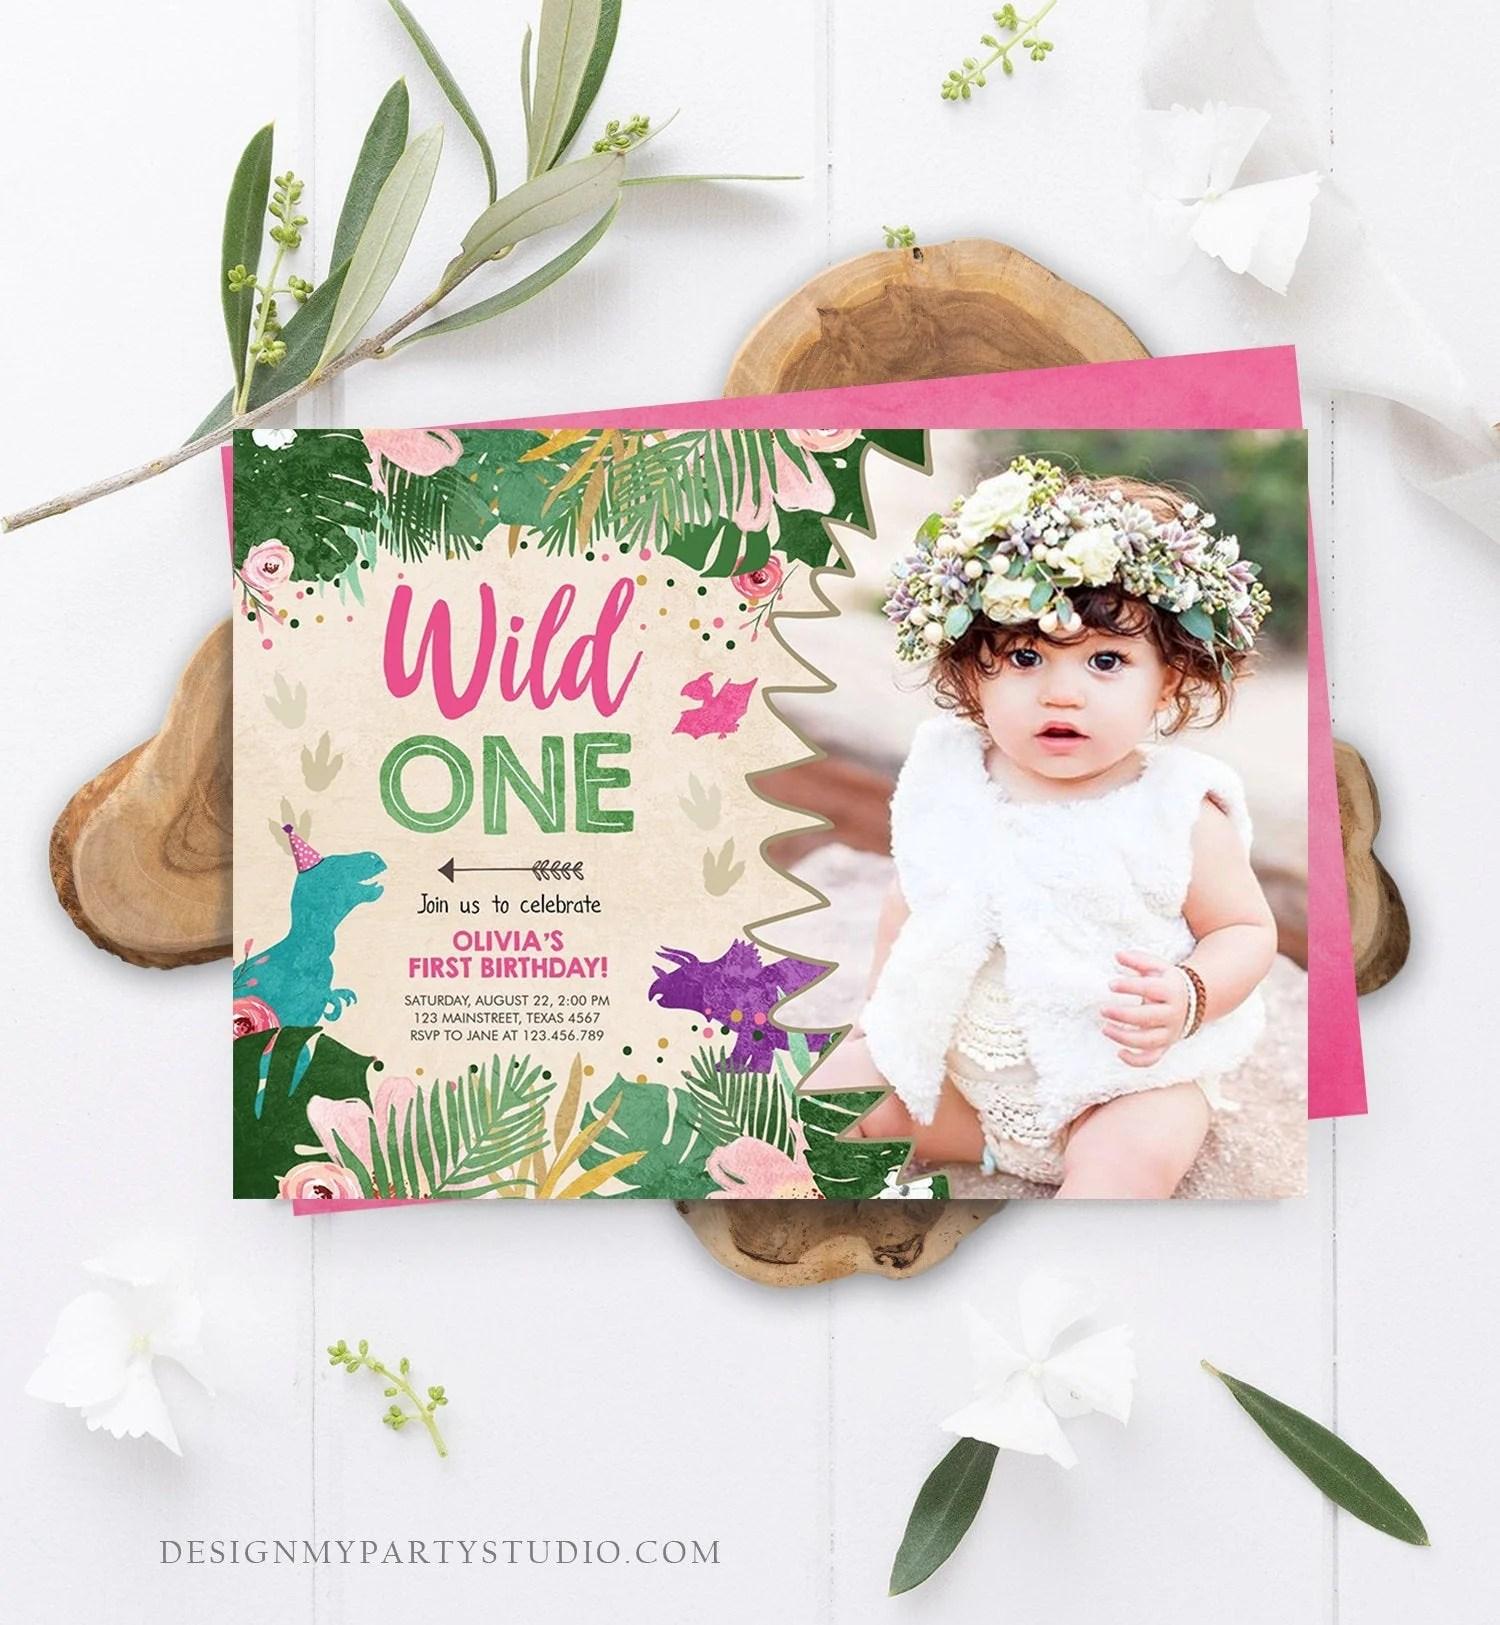 editable wild one birthday invitation dinosaur dino party girl 1st first birthday pink purple digital download corjl template printable 0146